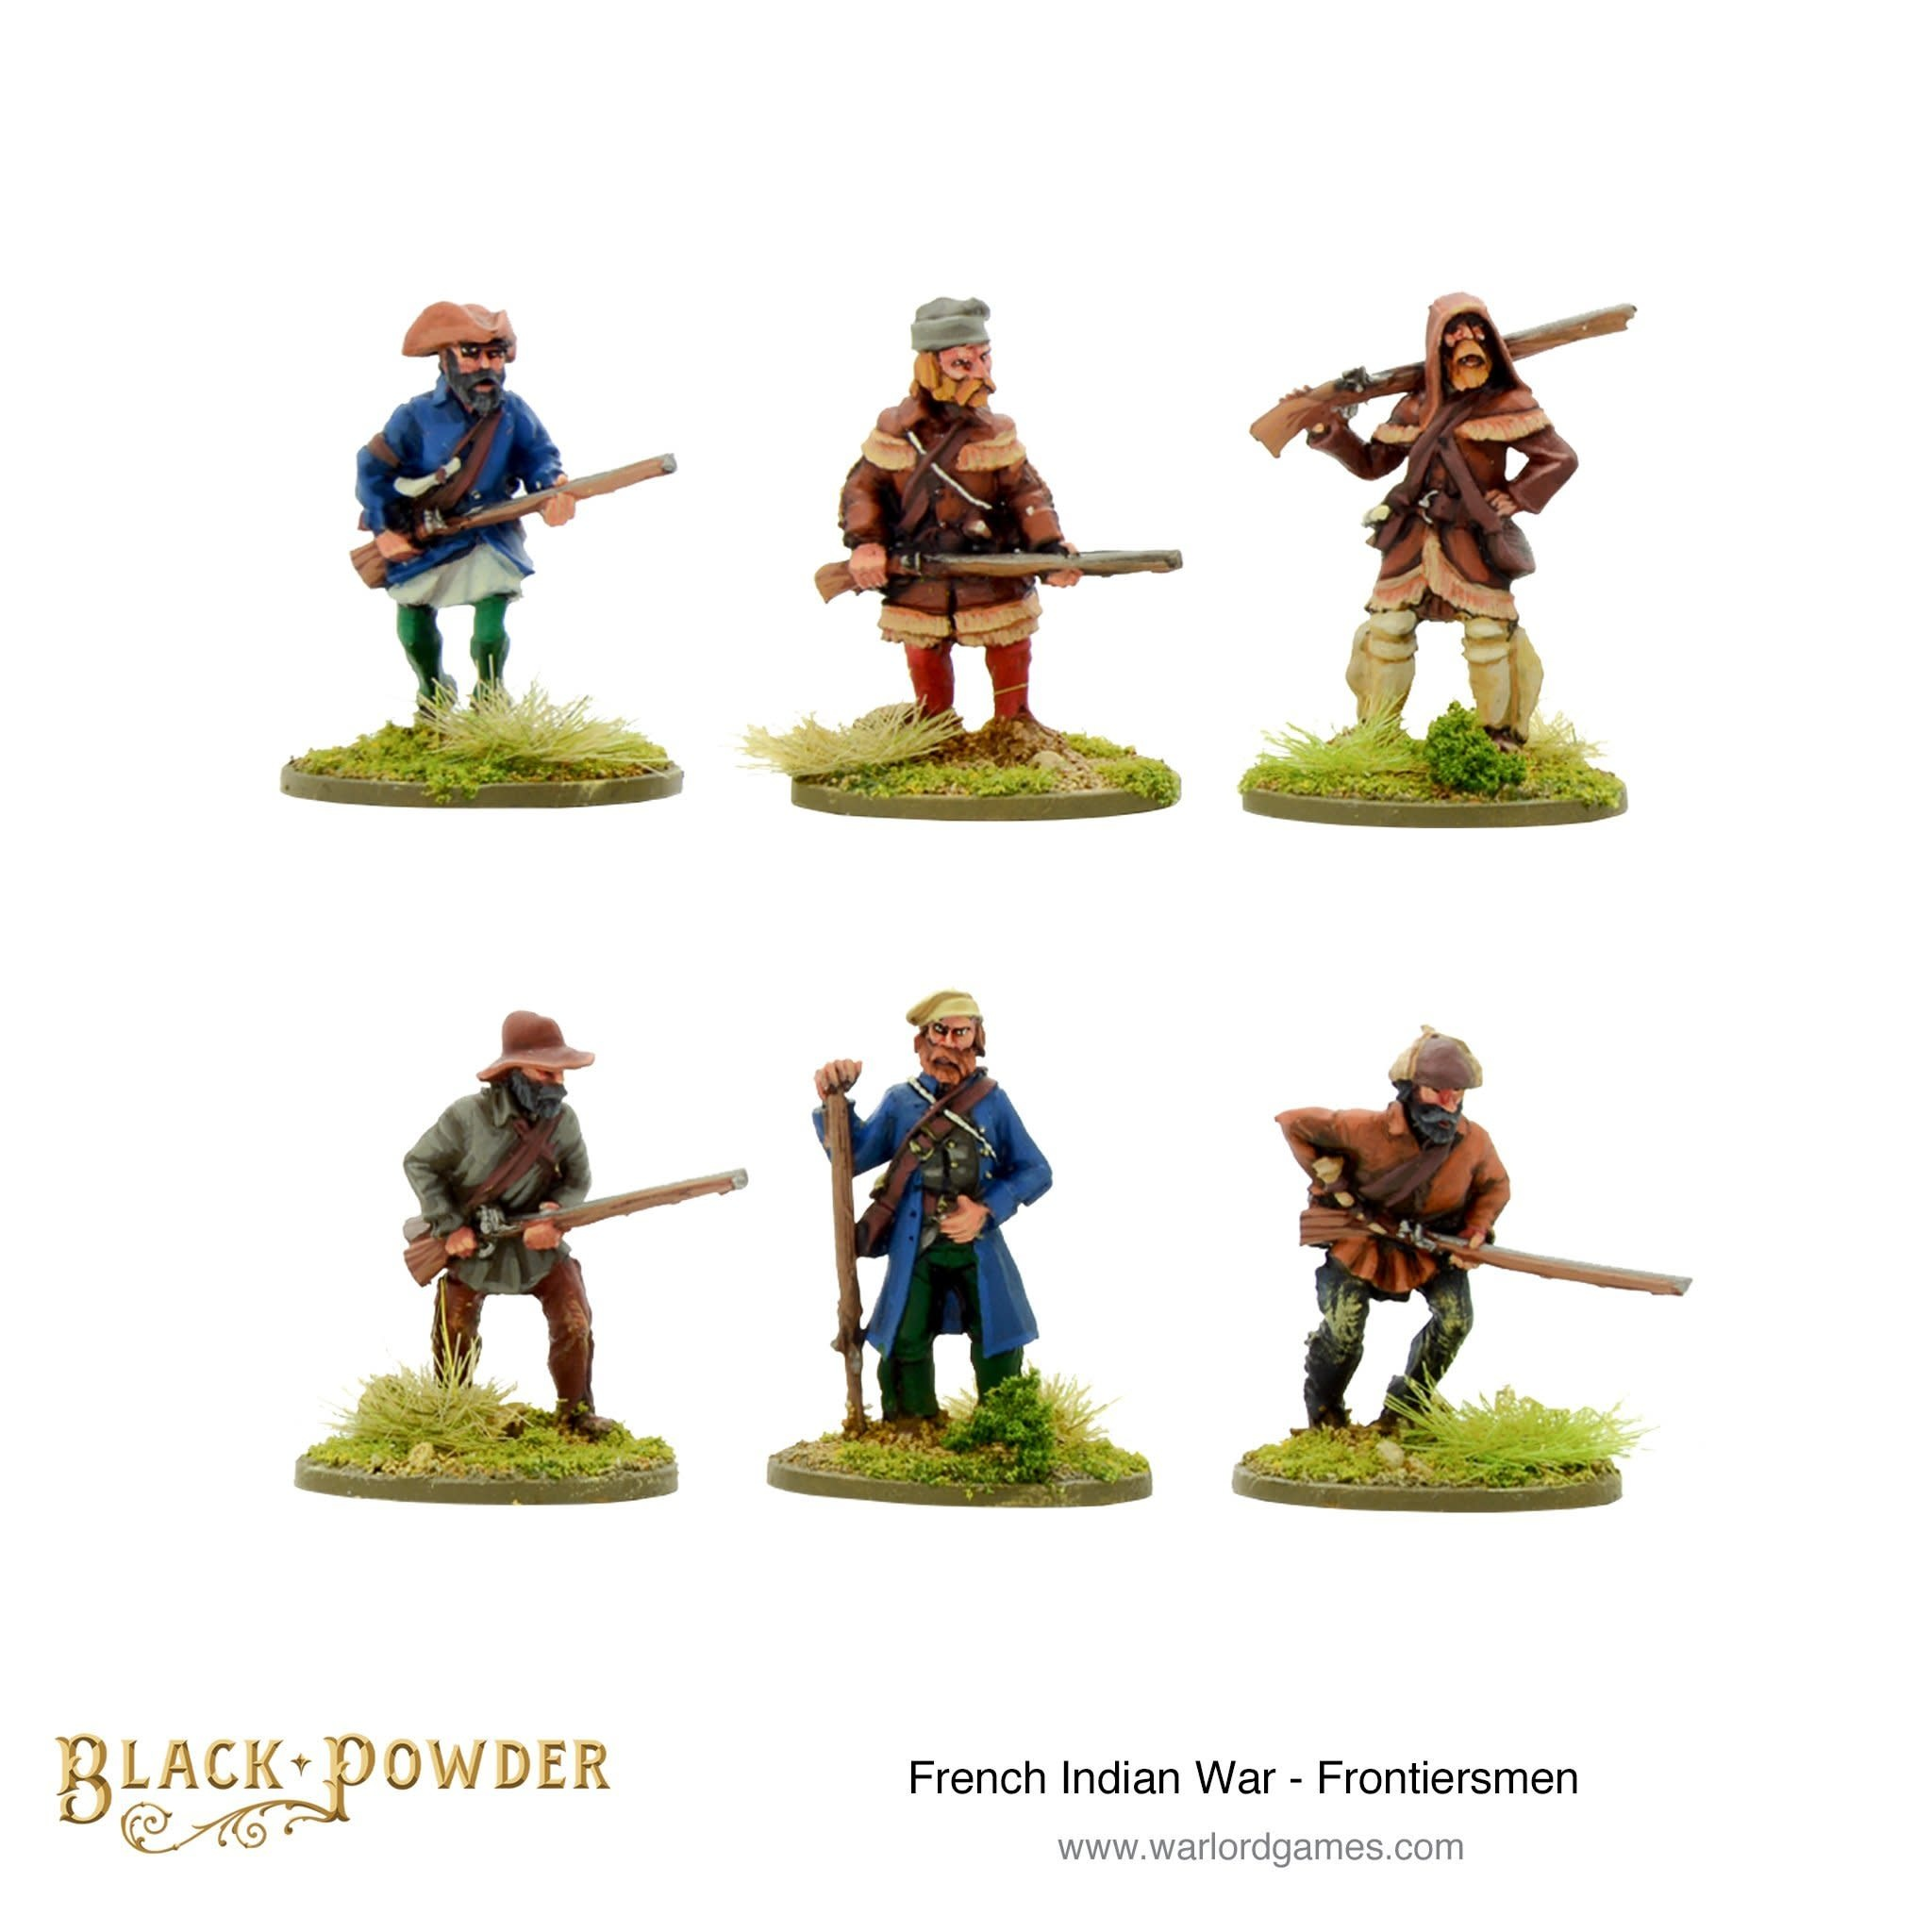 Warlord games Black Powder: FIW Frontiersmen